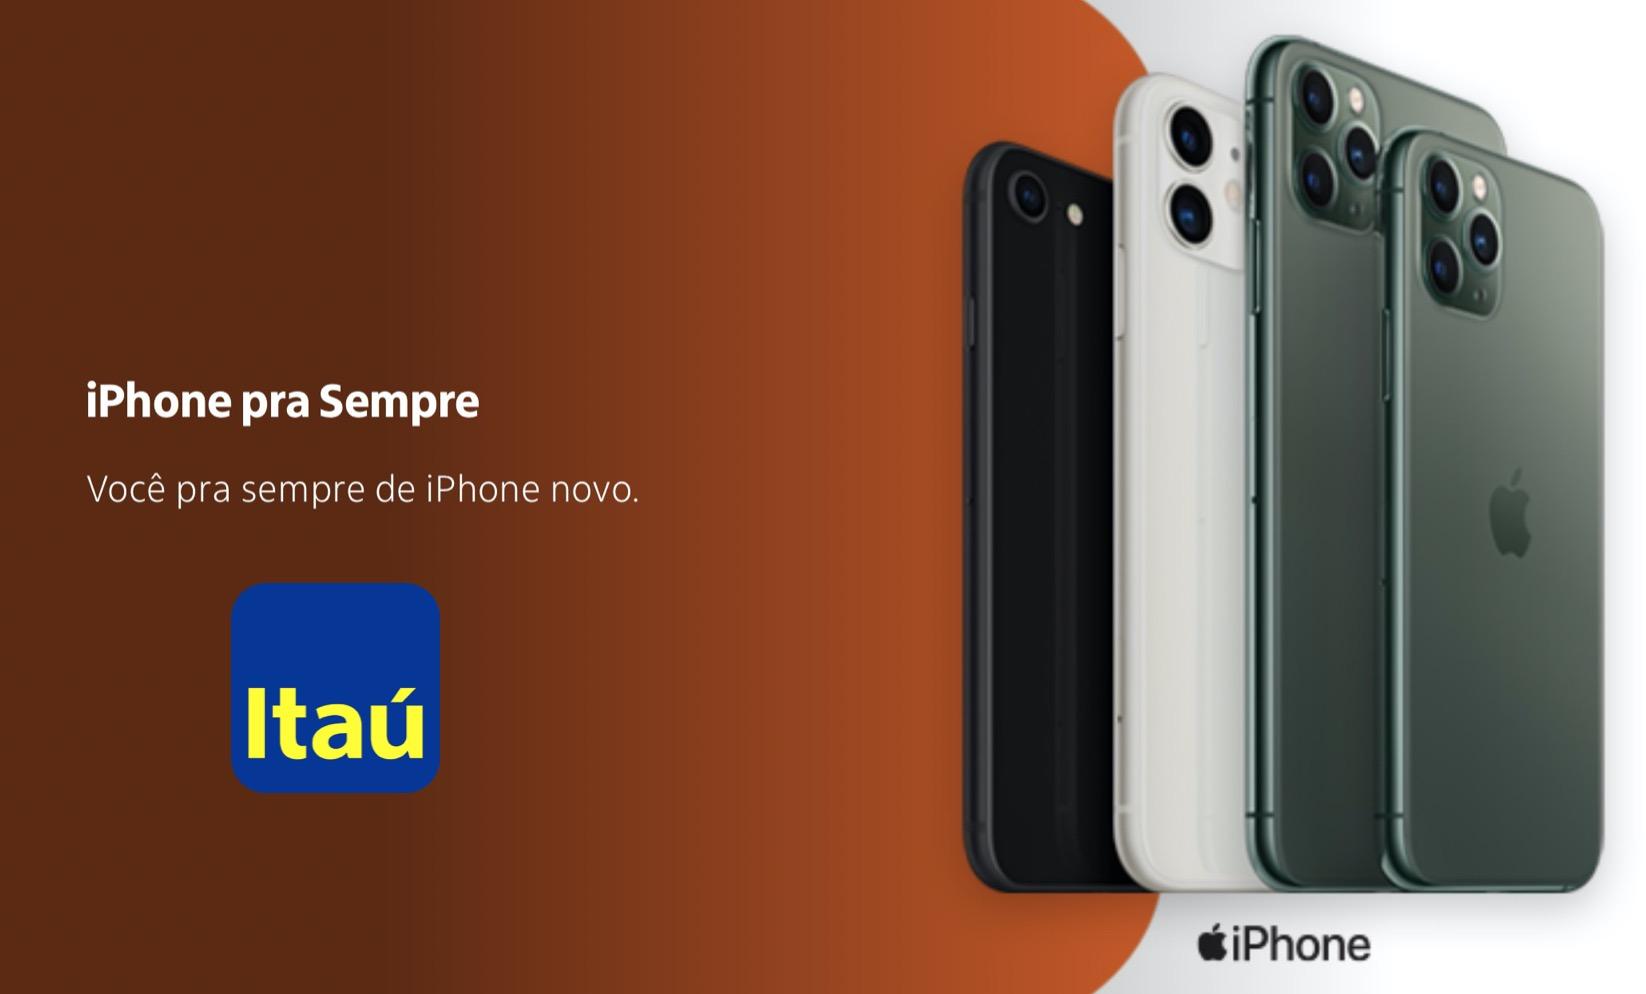 iPhone pra sempre Itaú